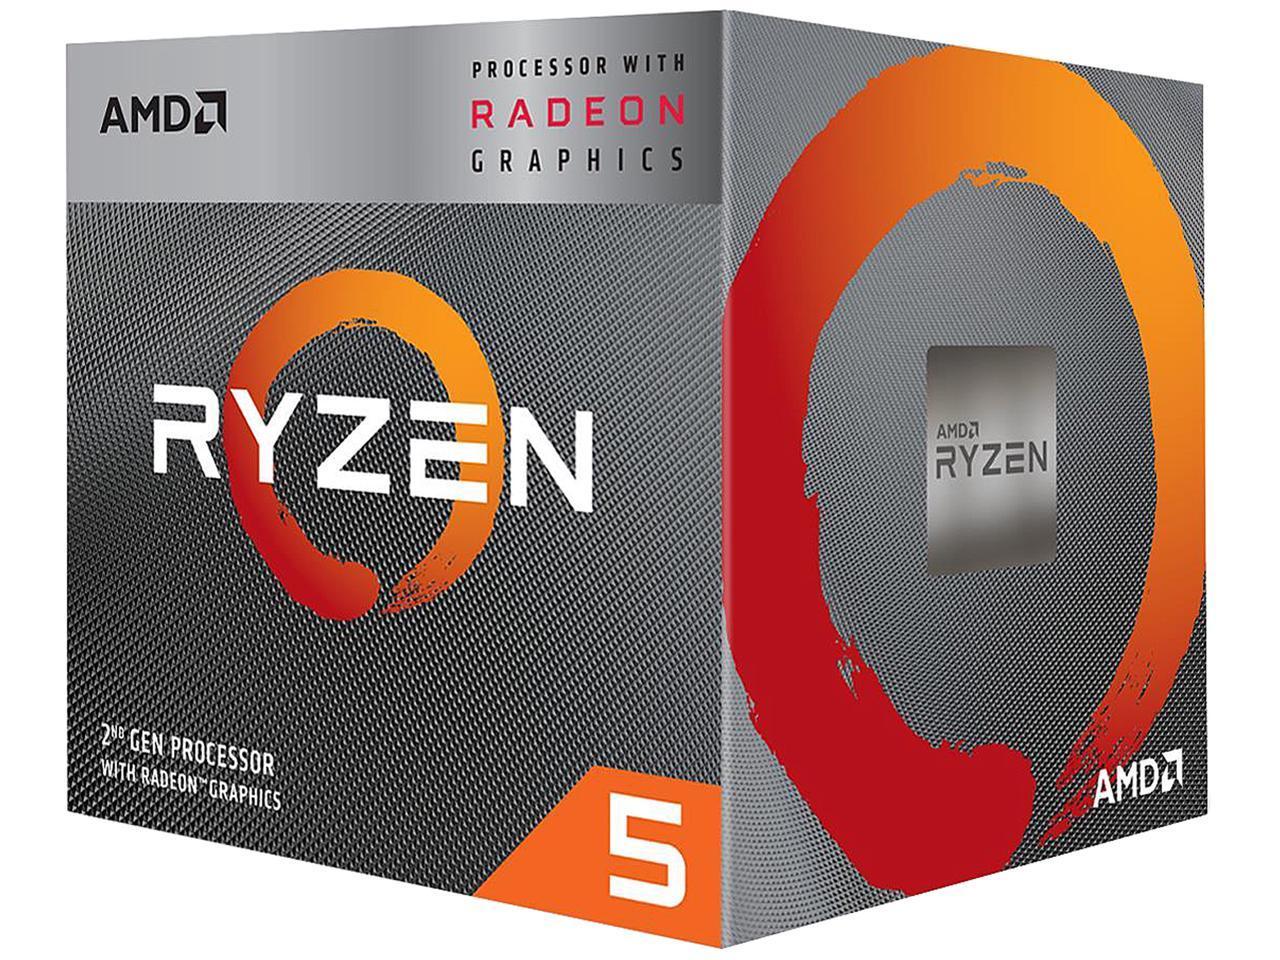 Fortnite Cpu 4 Cores Amd Ryzen 5 3400g 4 Core 3 7 Ghz Boost Desktop Processor Newegg Com